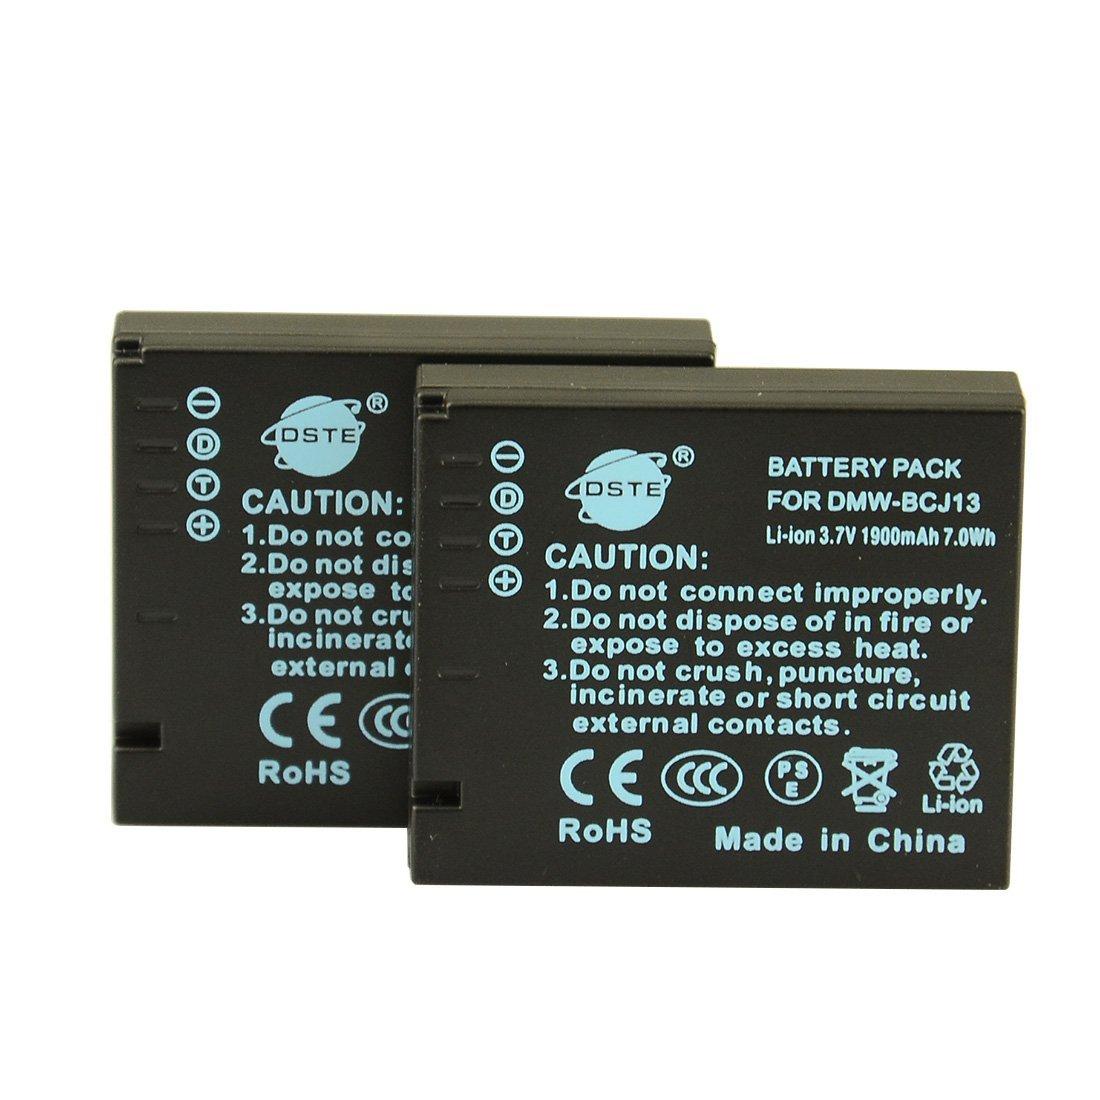 DSTE 2x DMW-BCJ13 Replacement Li-ion Battery for Panasonic Lumix DMC-LX5 LX5GK LX5K LX5W LX7 LX7GK LX7K LX7W Camera as DMW-BCJ13E